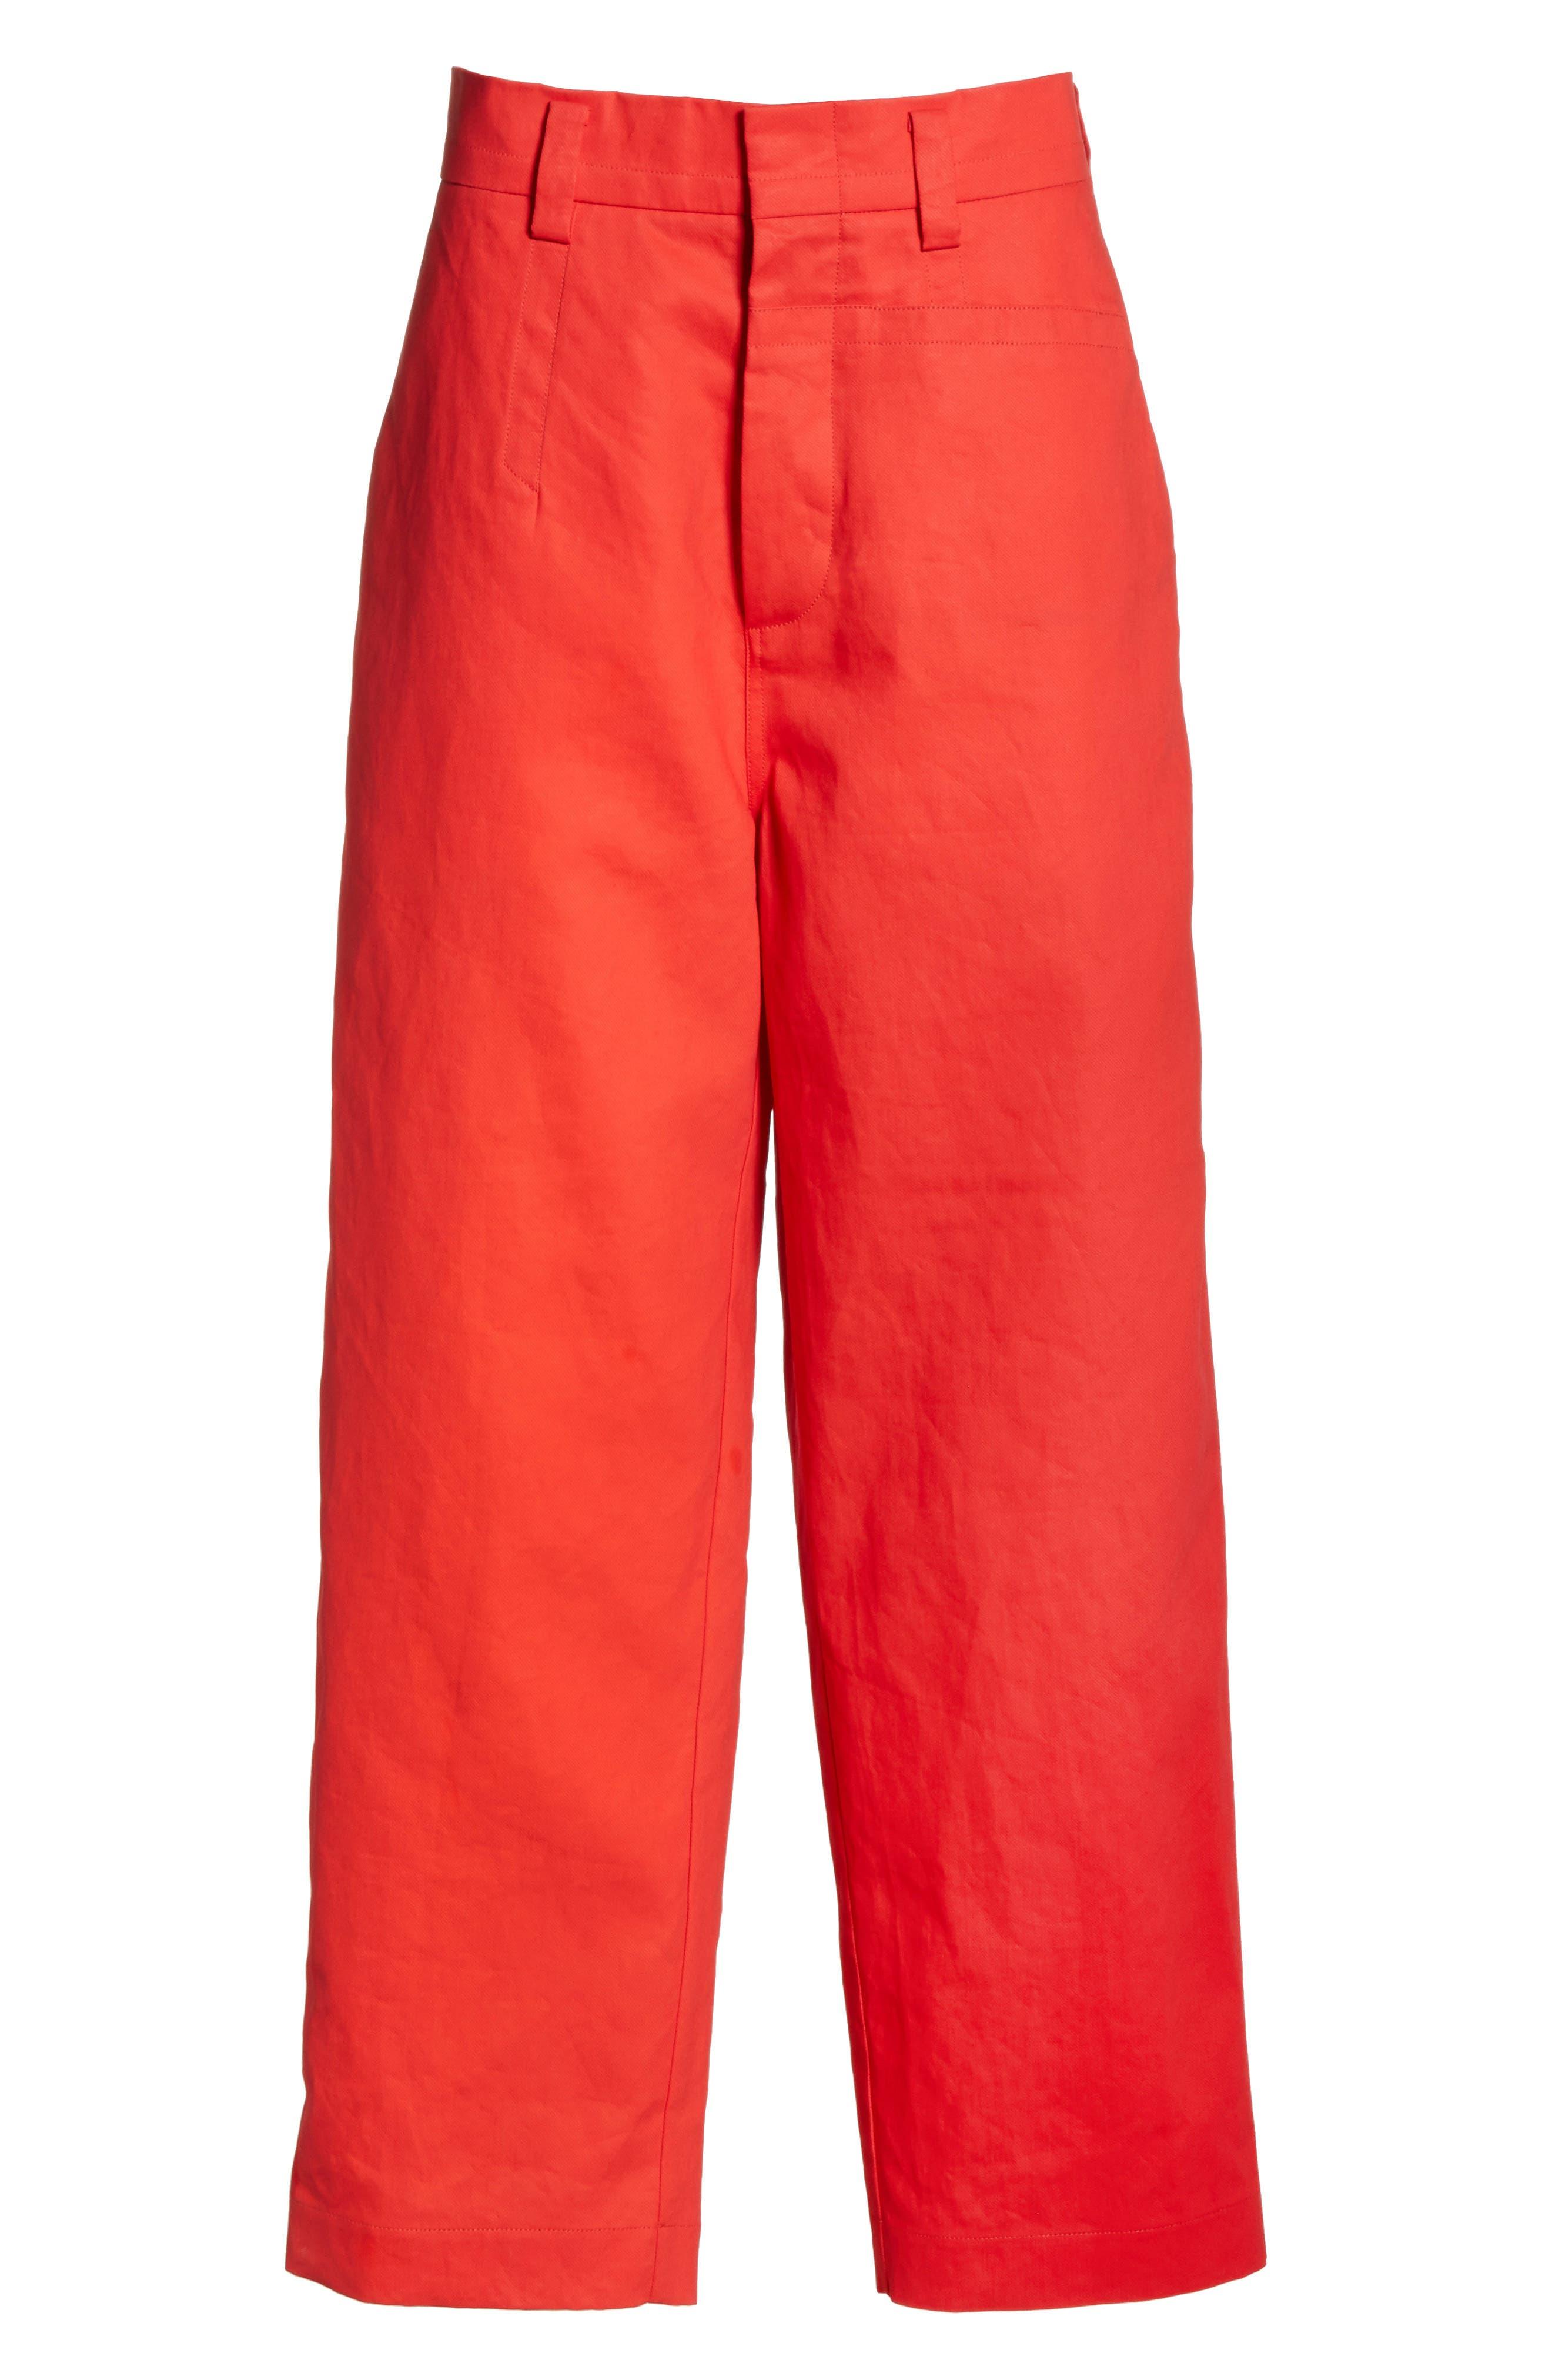 Straight Leg Pants,                             Alternate thumbnail 6, color,                             600